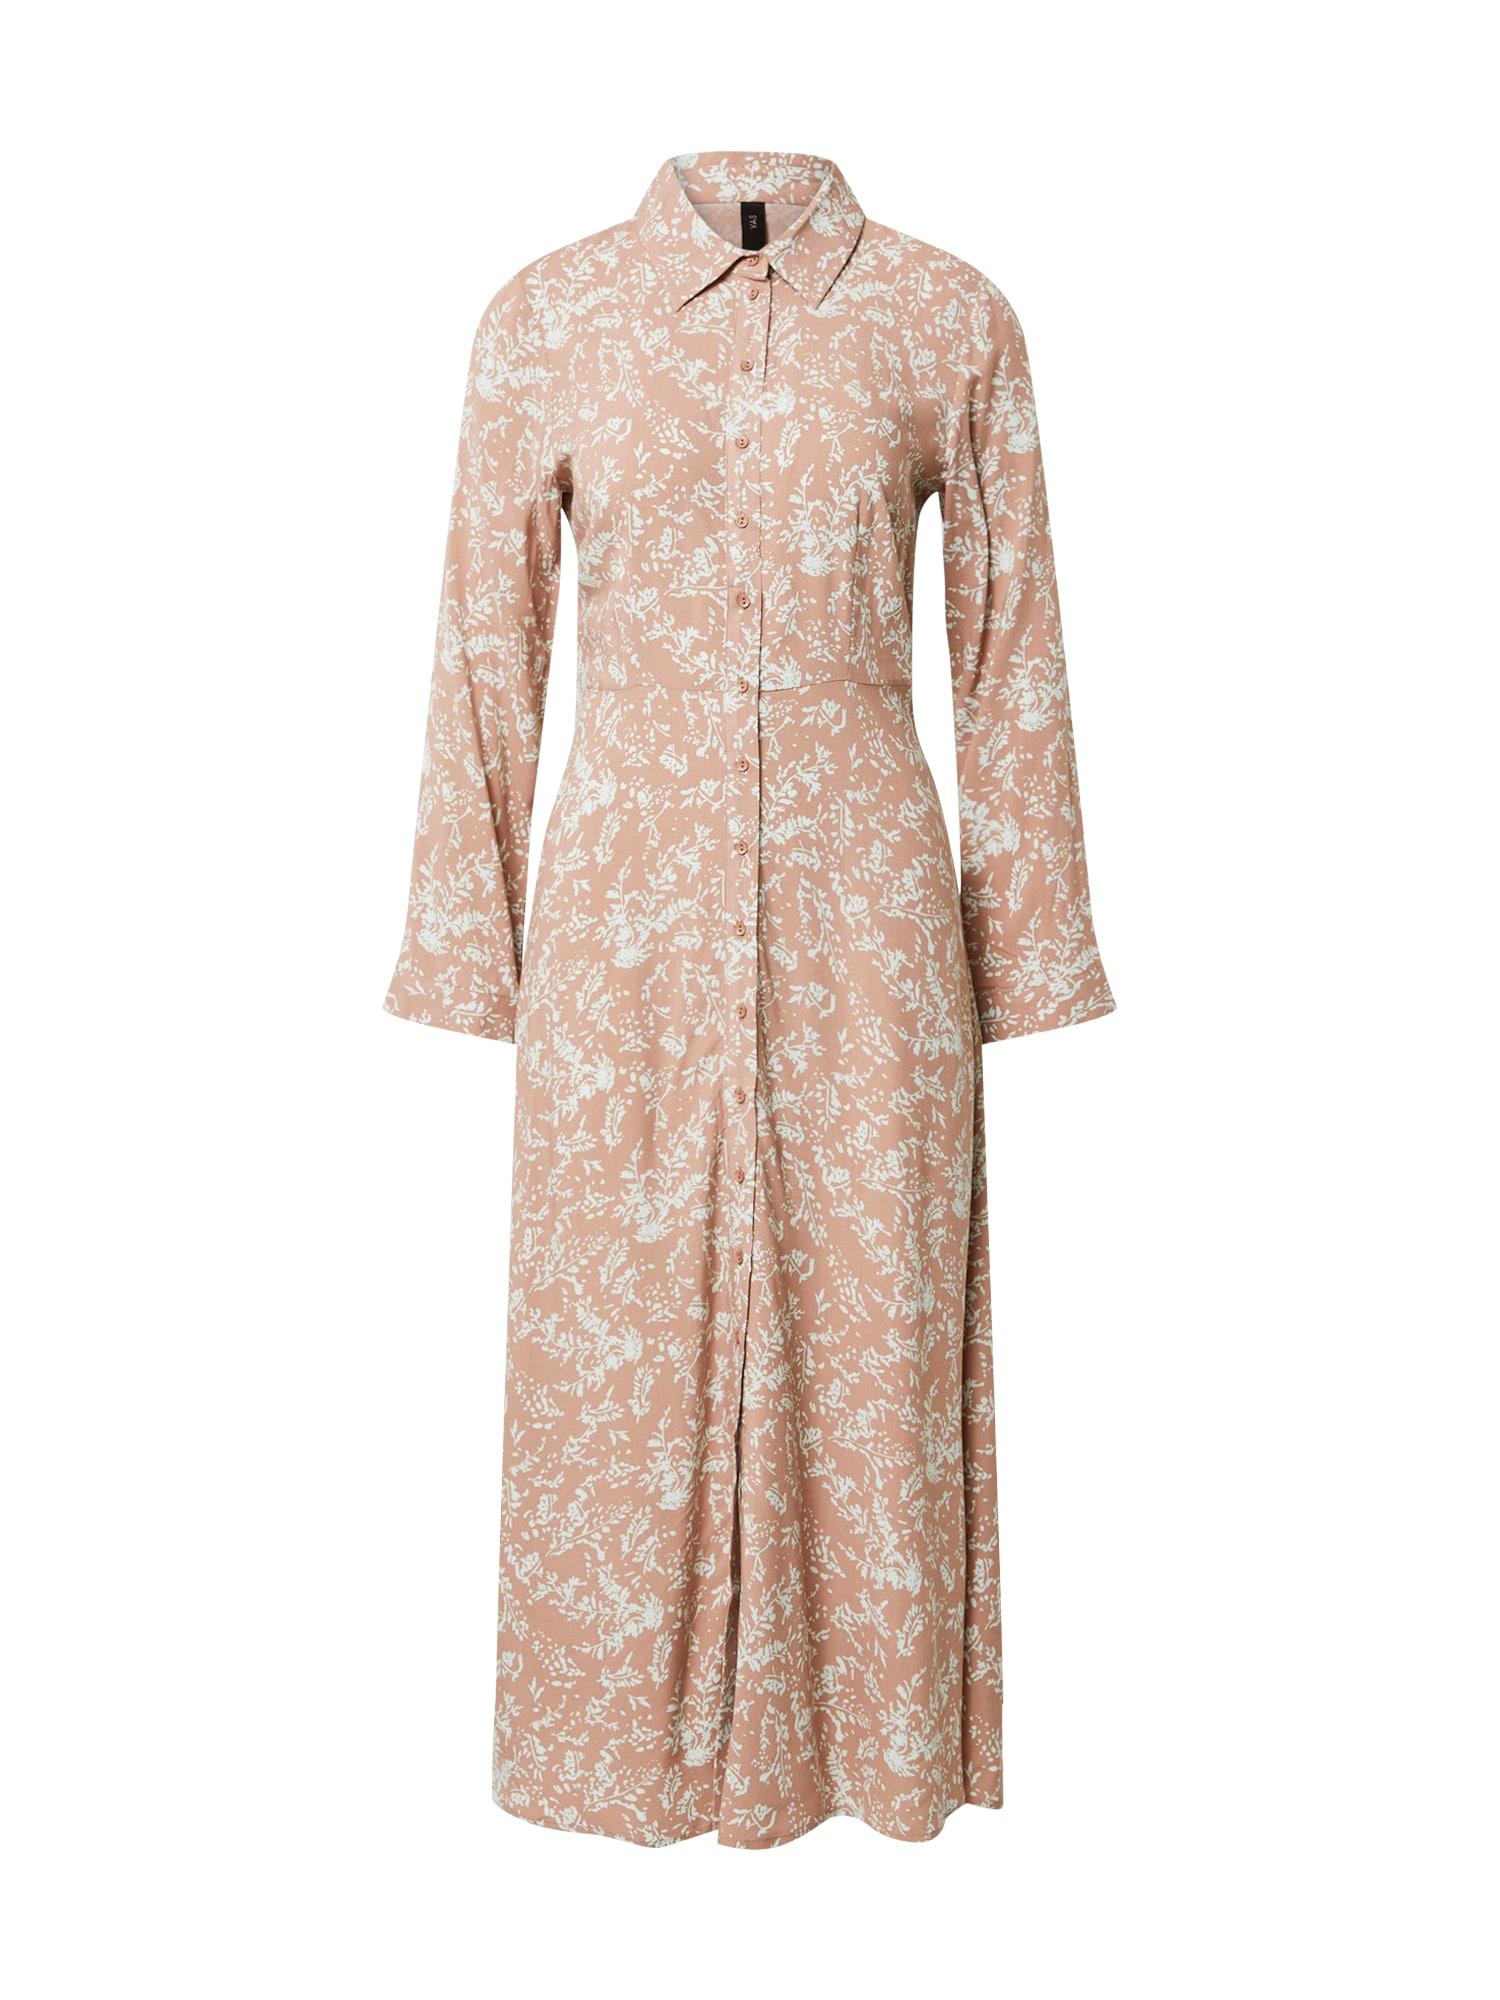 Y.A.S Košeľové šaty 'YASCORNA SAVANNA'  hnedé